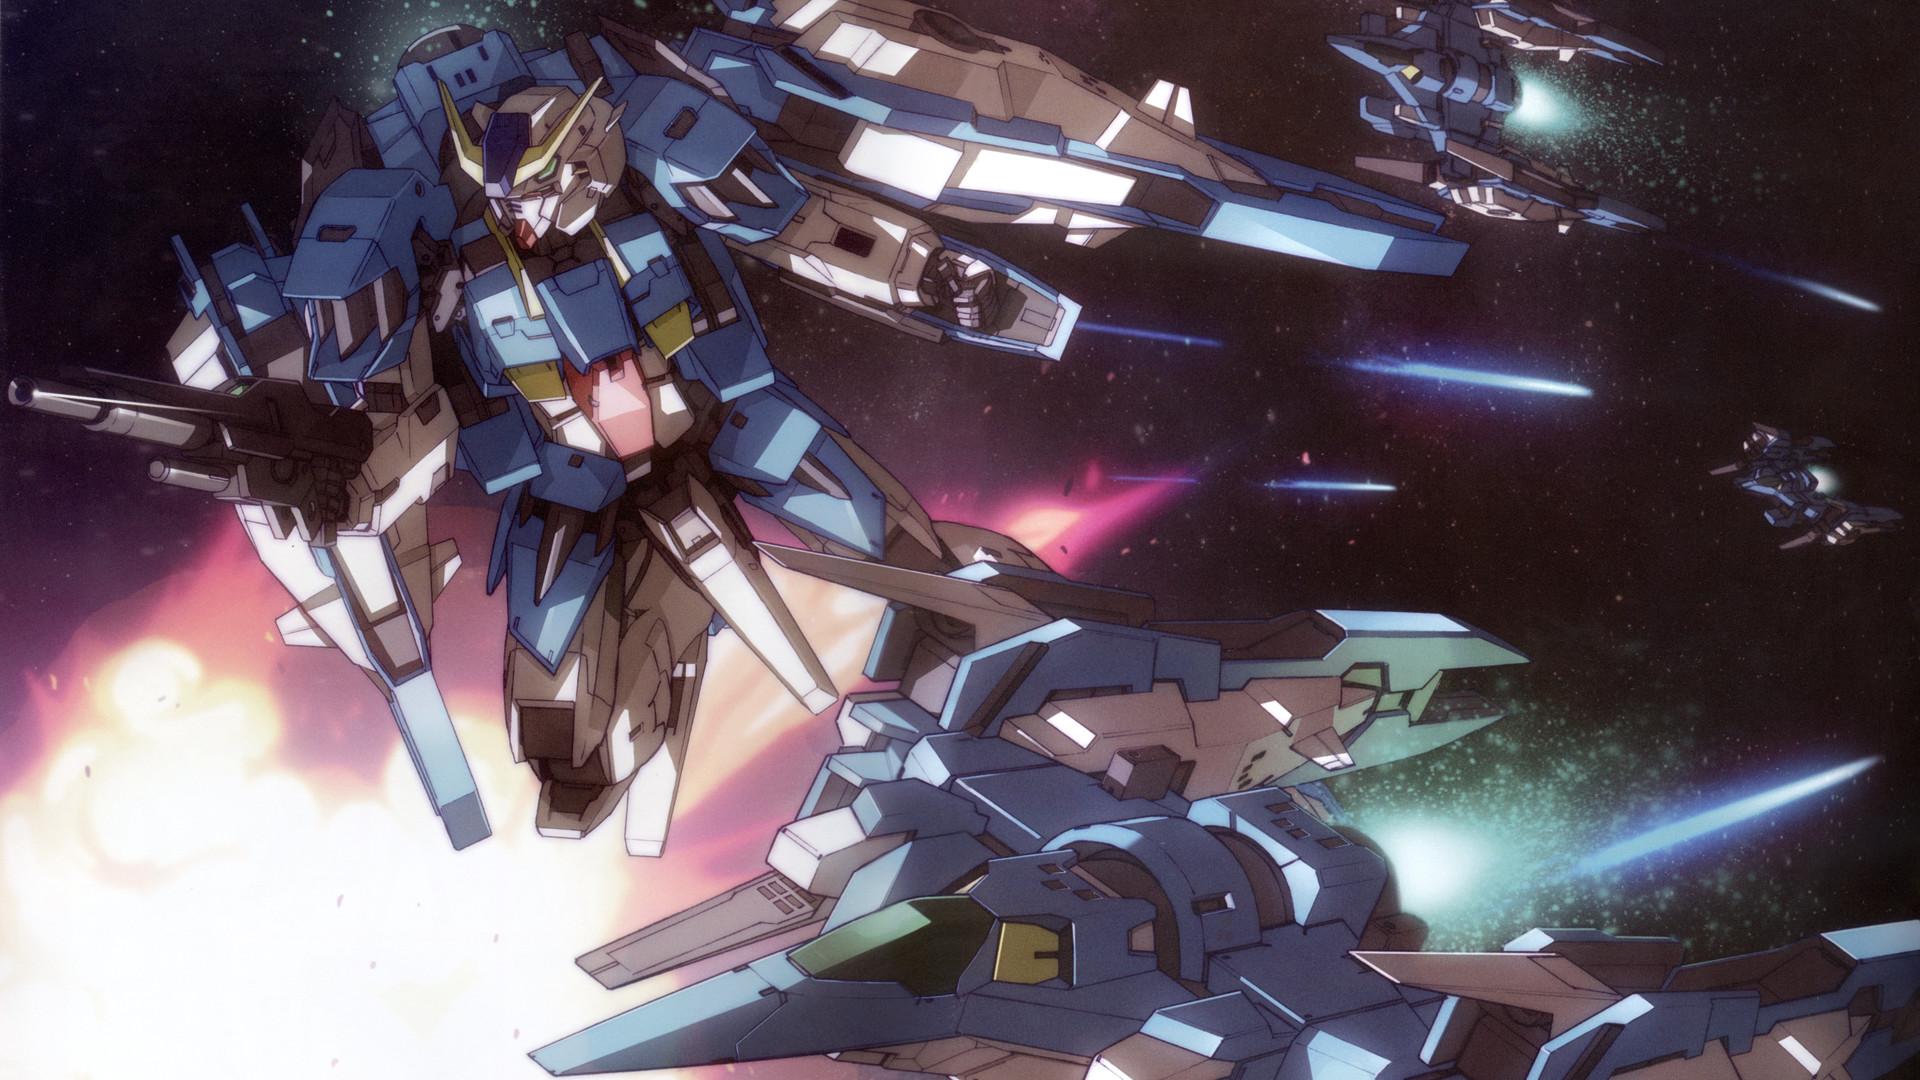 Gundam Wallpaper 1080p